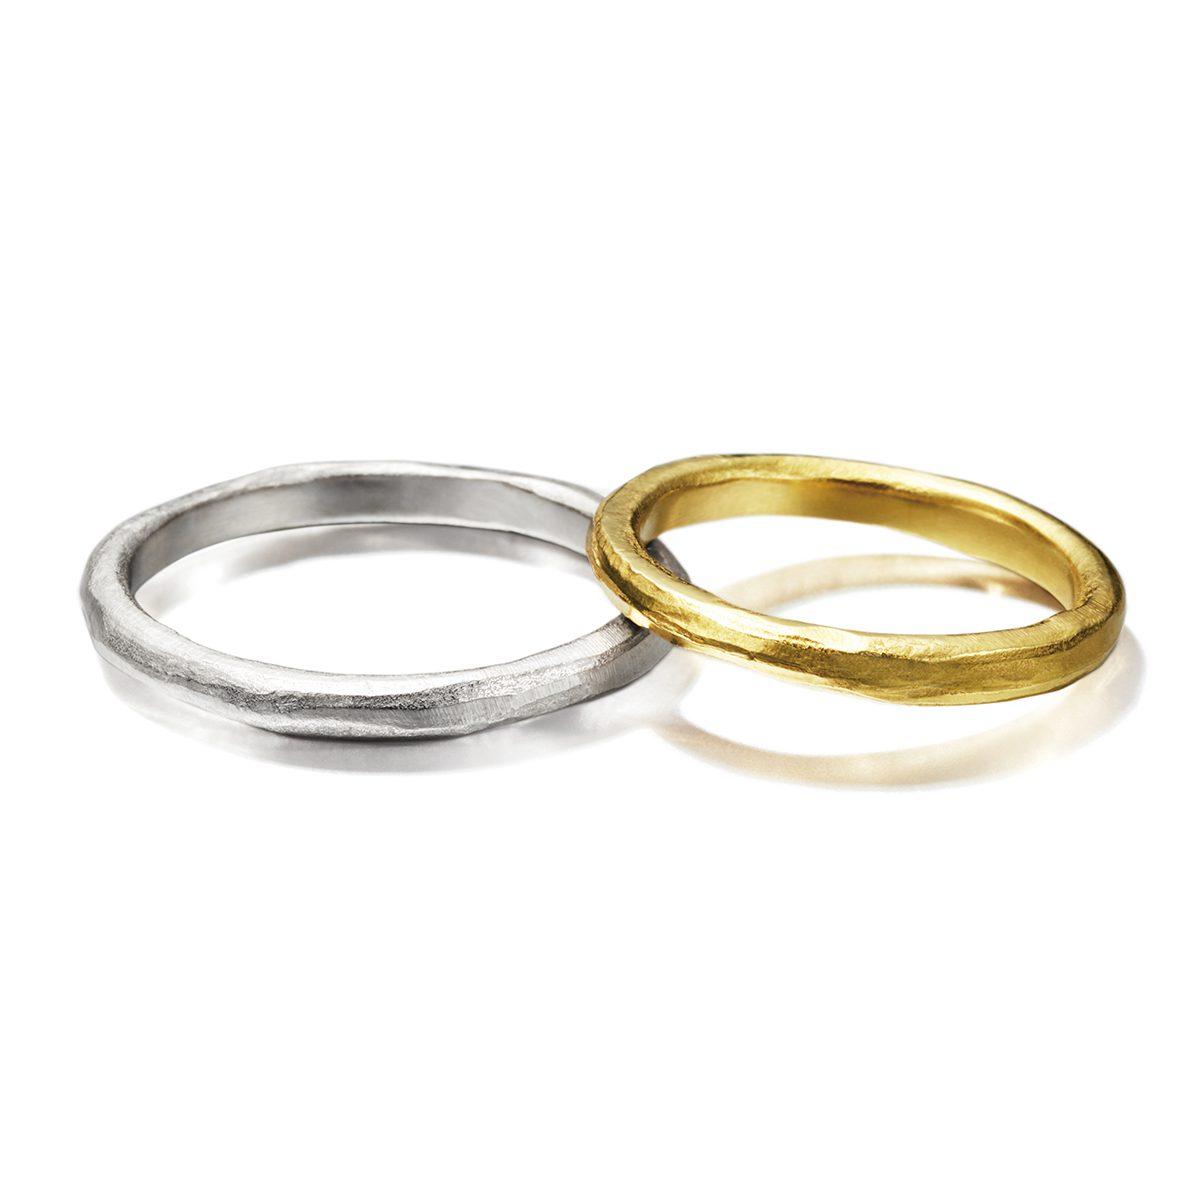 IOSSELLIANI - PROMESSA Marriage Rings